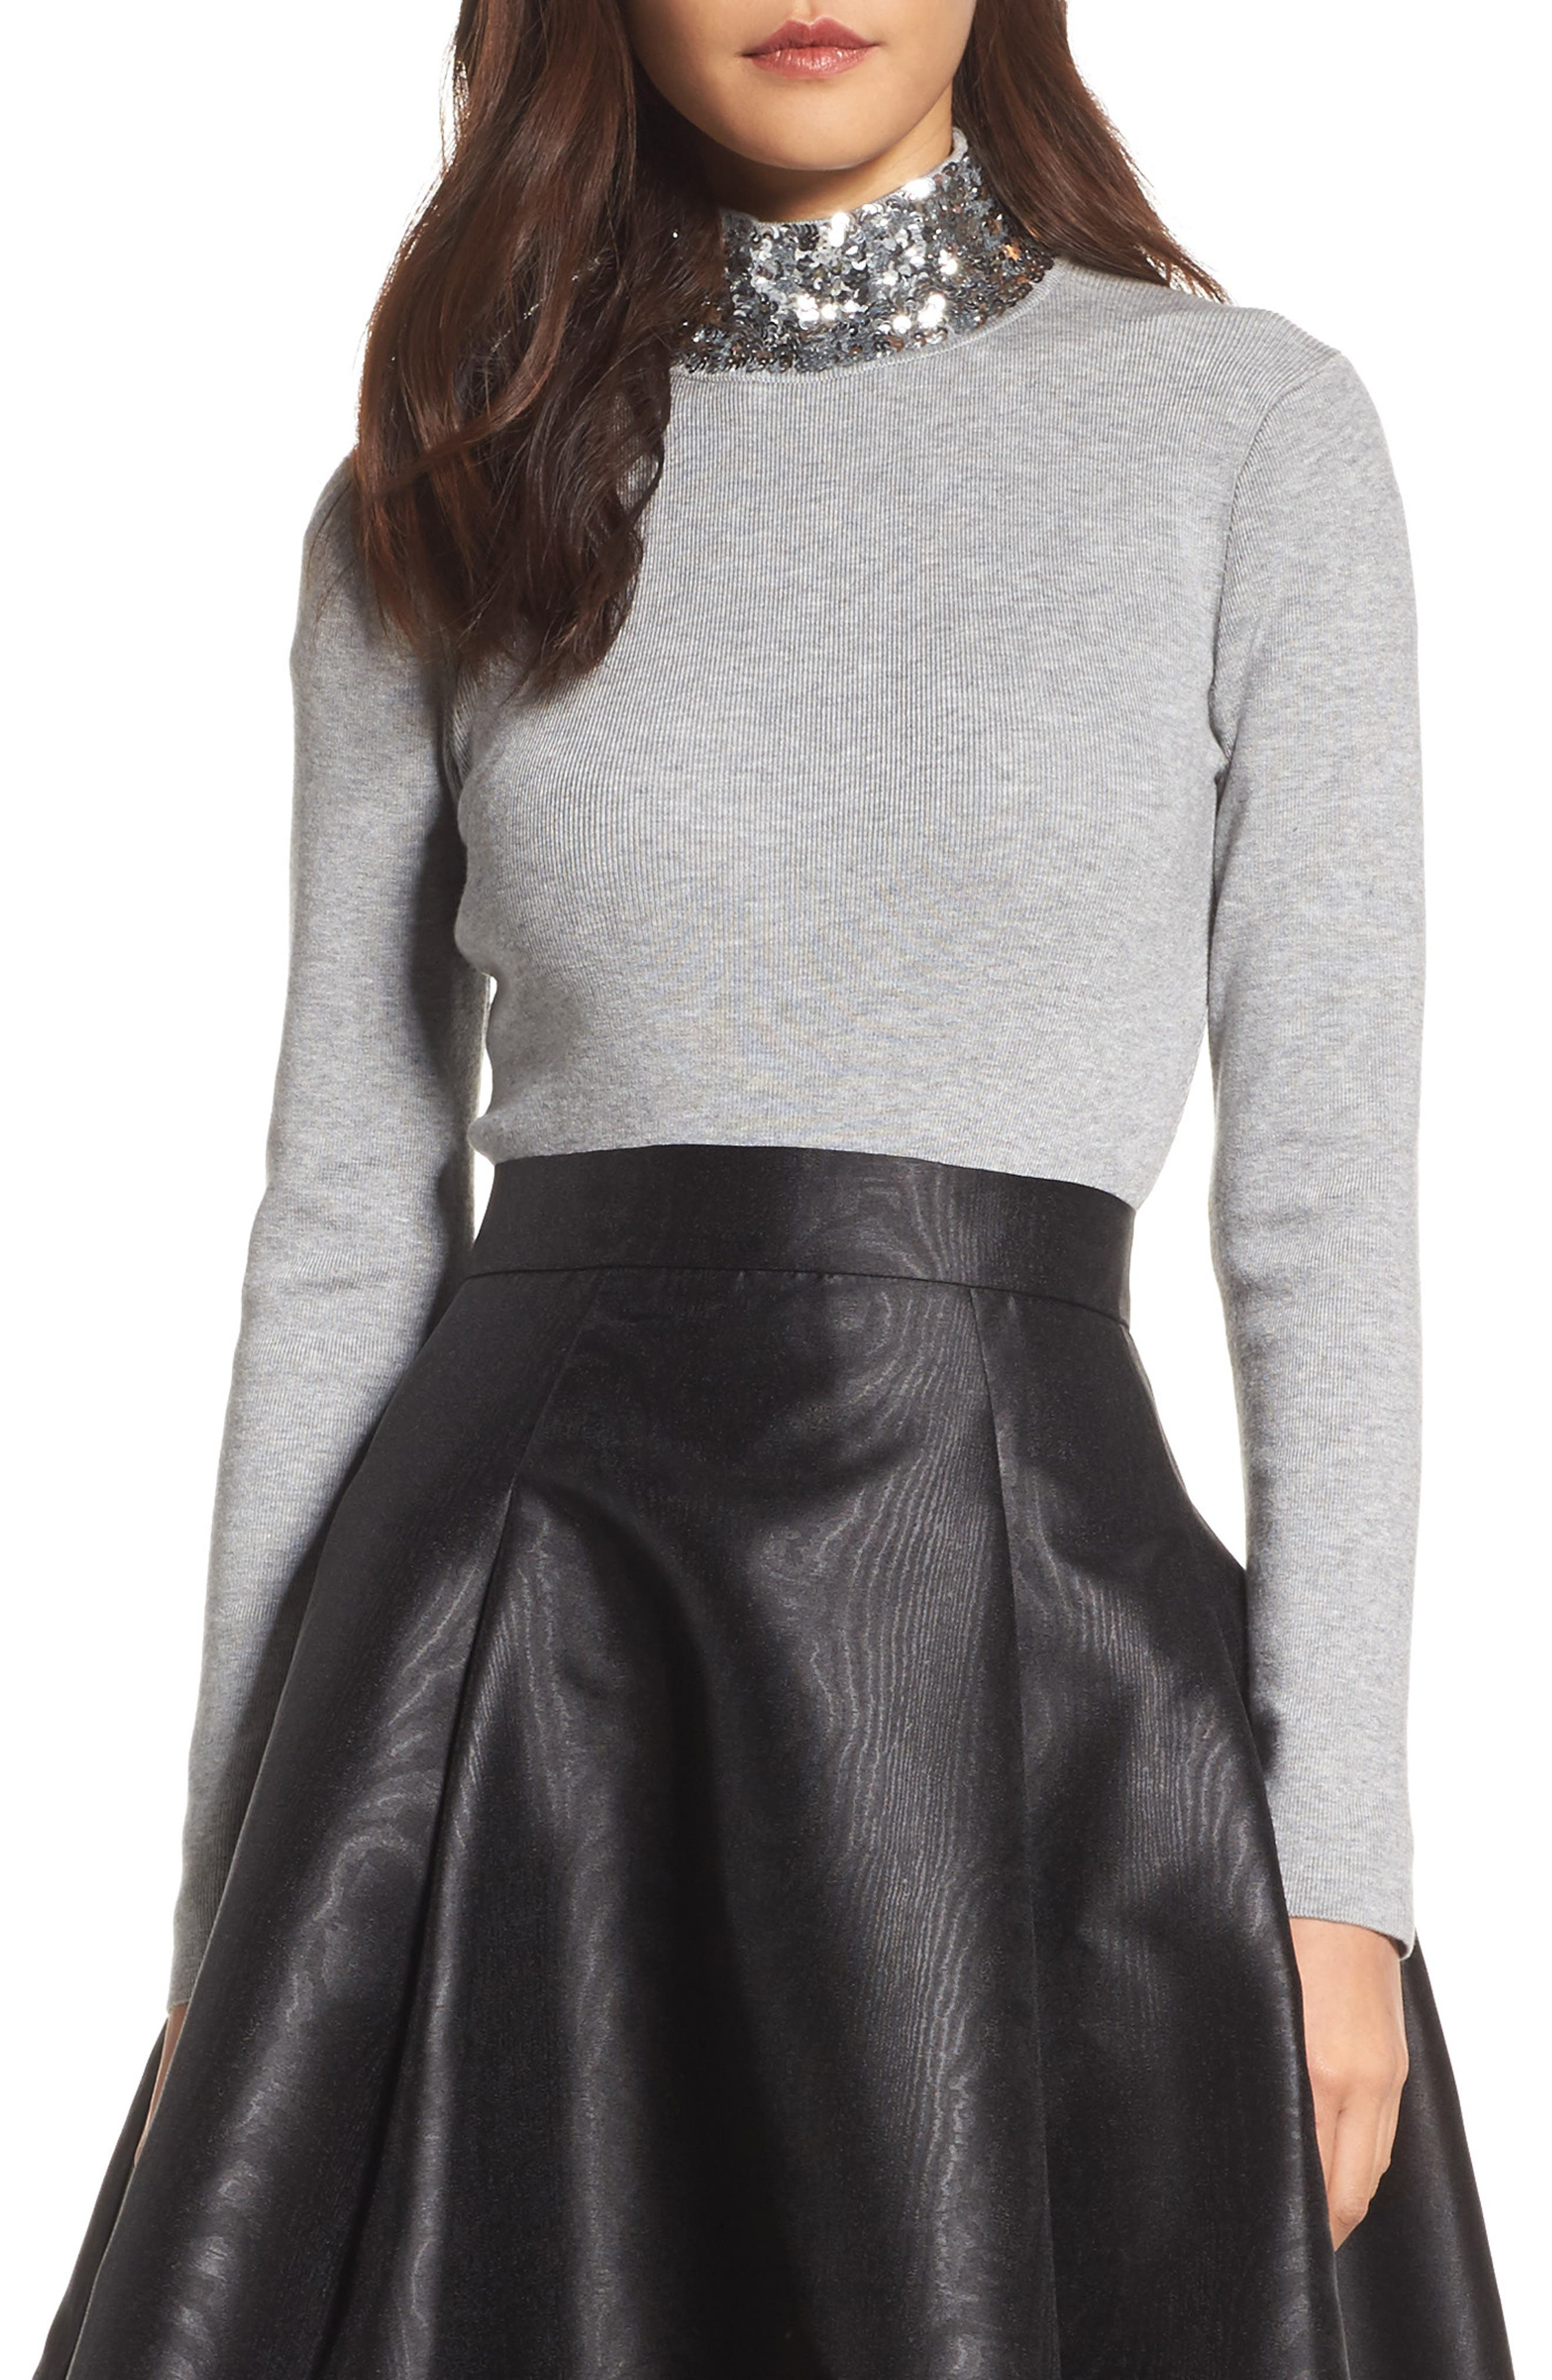 Sequin Mock Neck Sweater,                             Main thumbnail 1, color,                             030